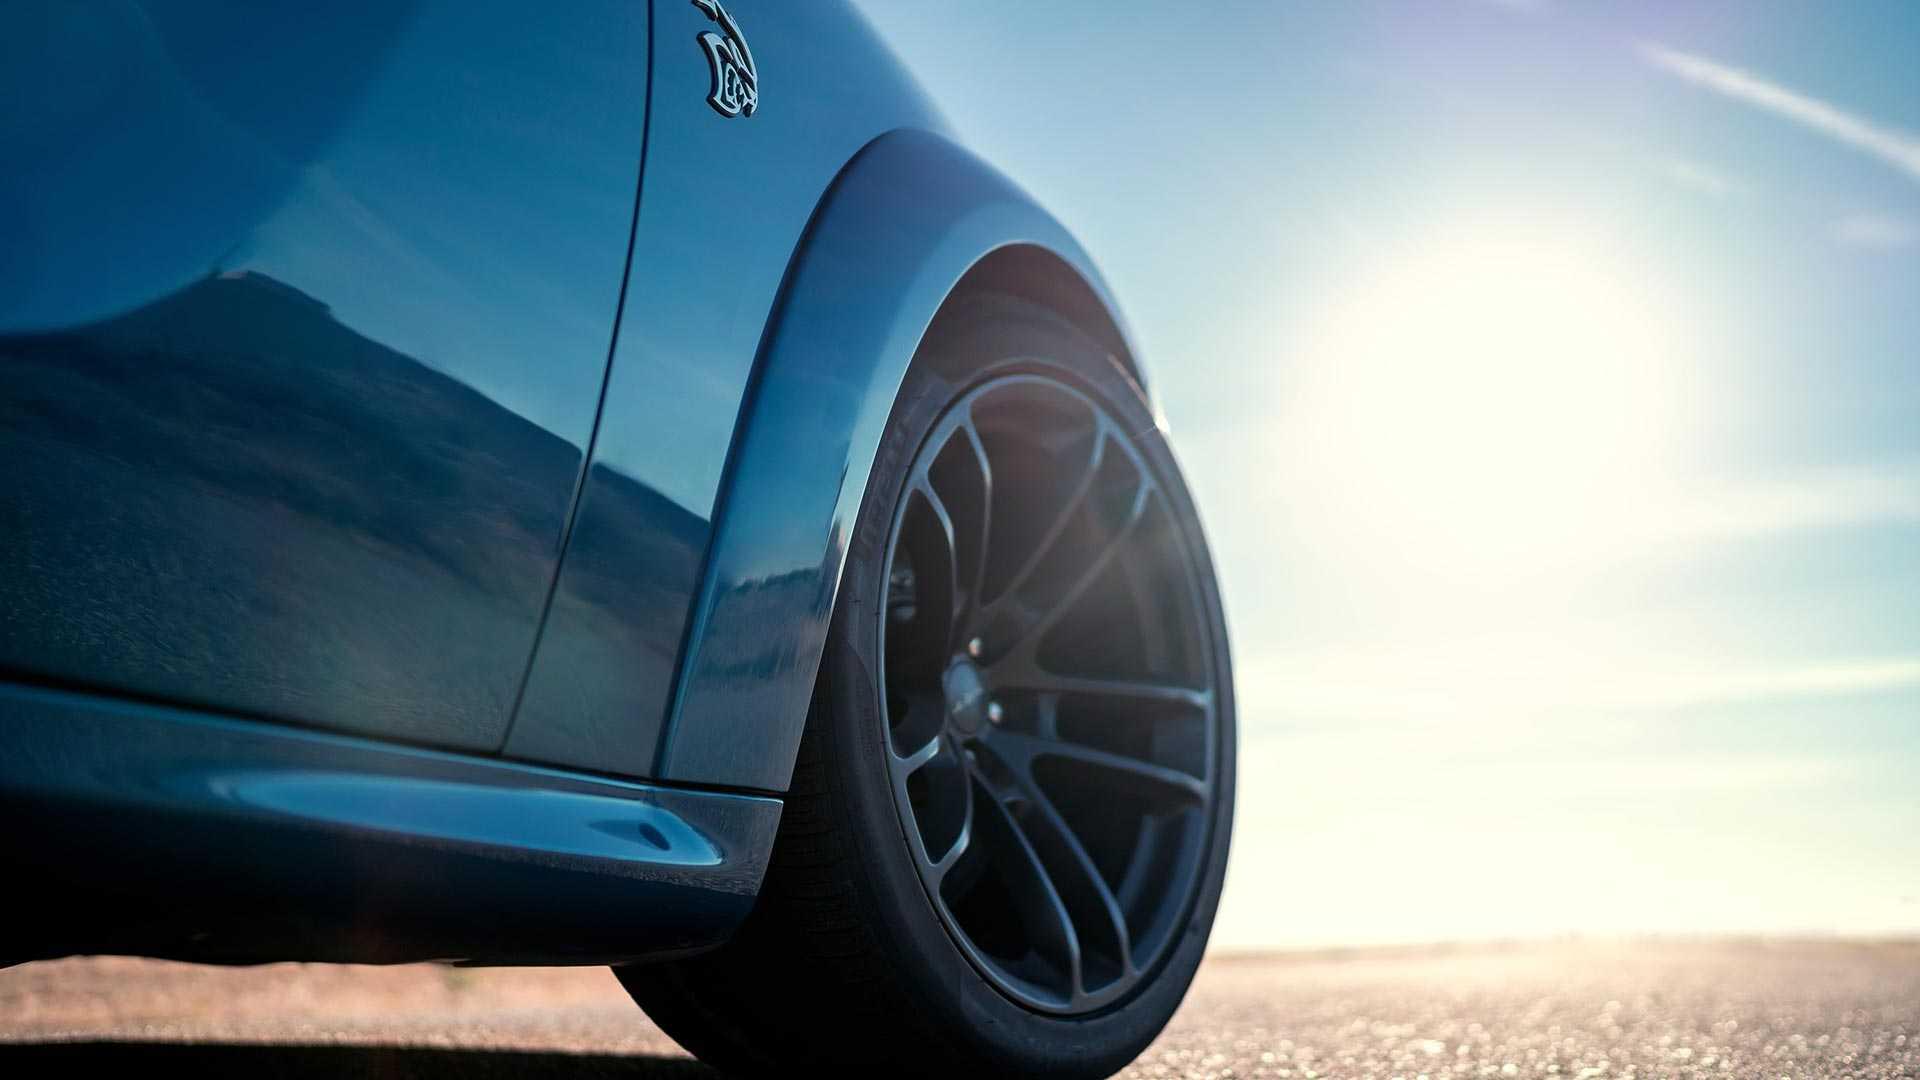 2020 Dodge Charger SRT Hellcat Widebody Wheel Wallpapers #151 of 183